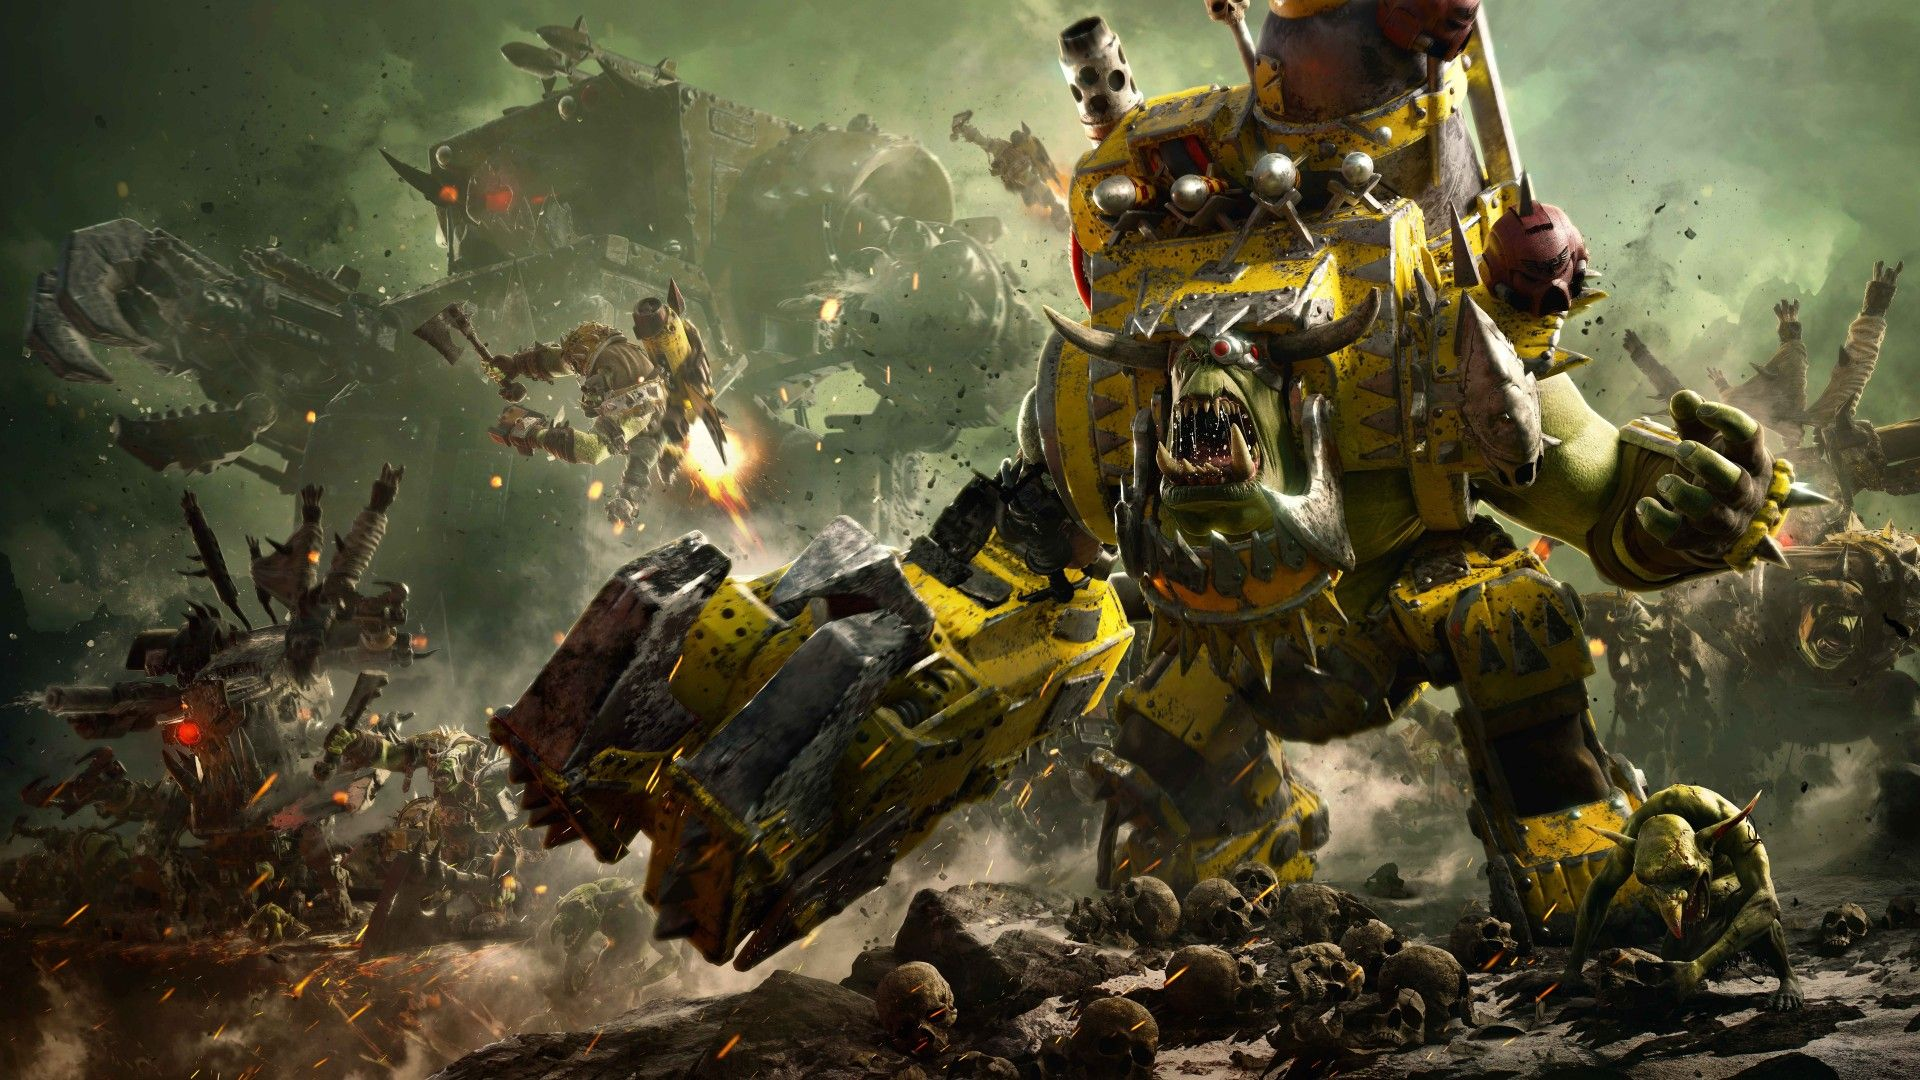 Warhammer 40K, Dawn of War III, Ork Faction, 4K, 8K